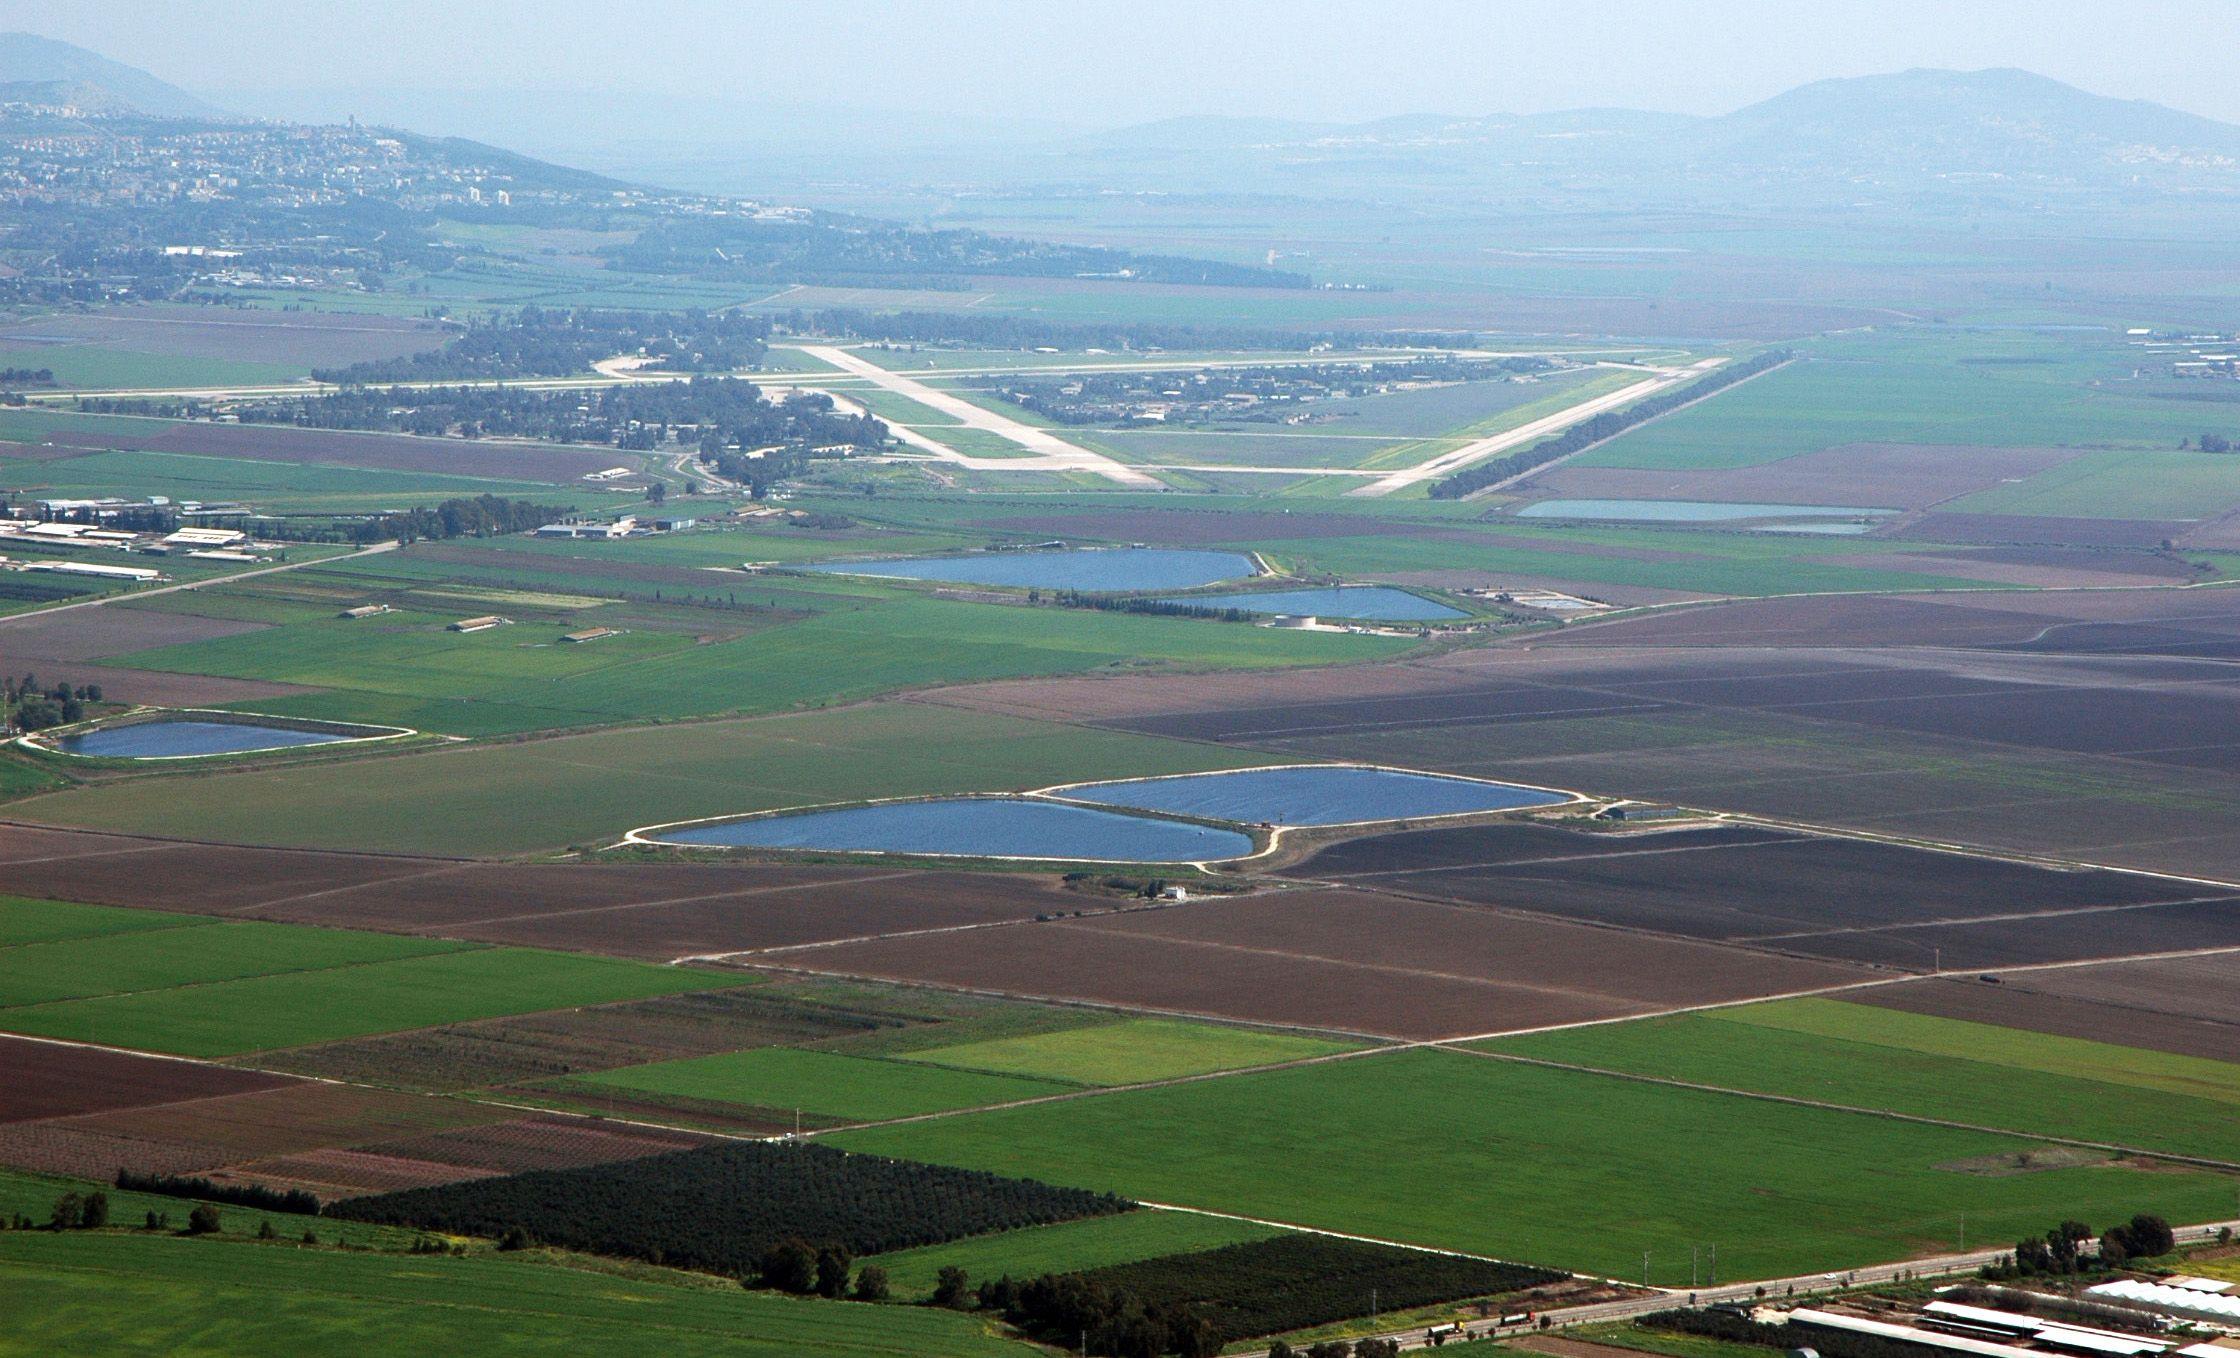 Jezreel Valley, Israel where the battle of Armageddon will ... - photo#27